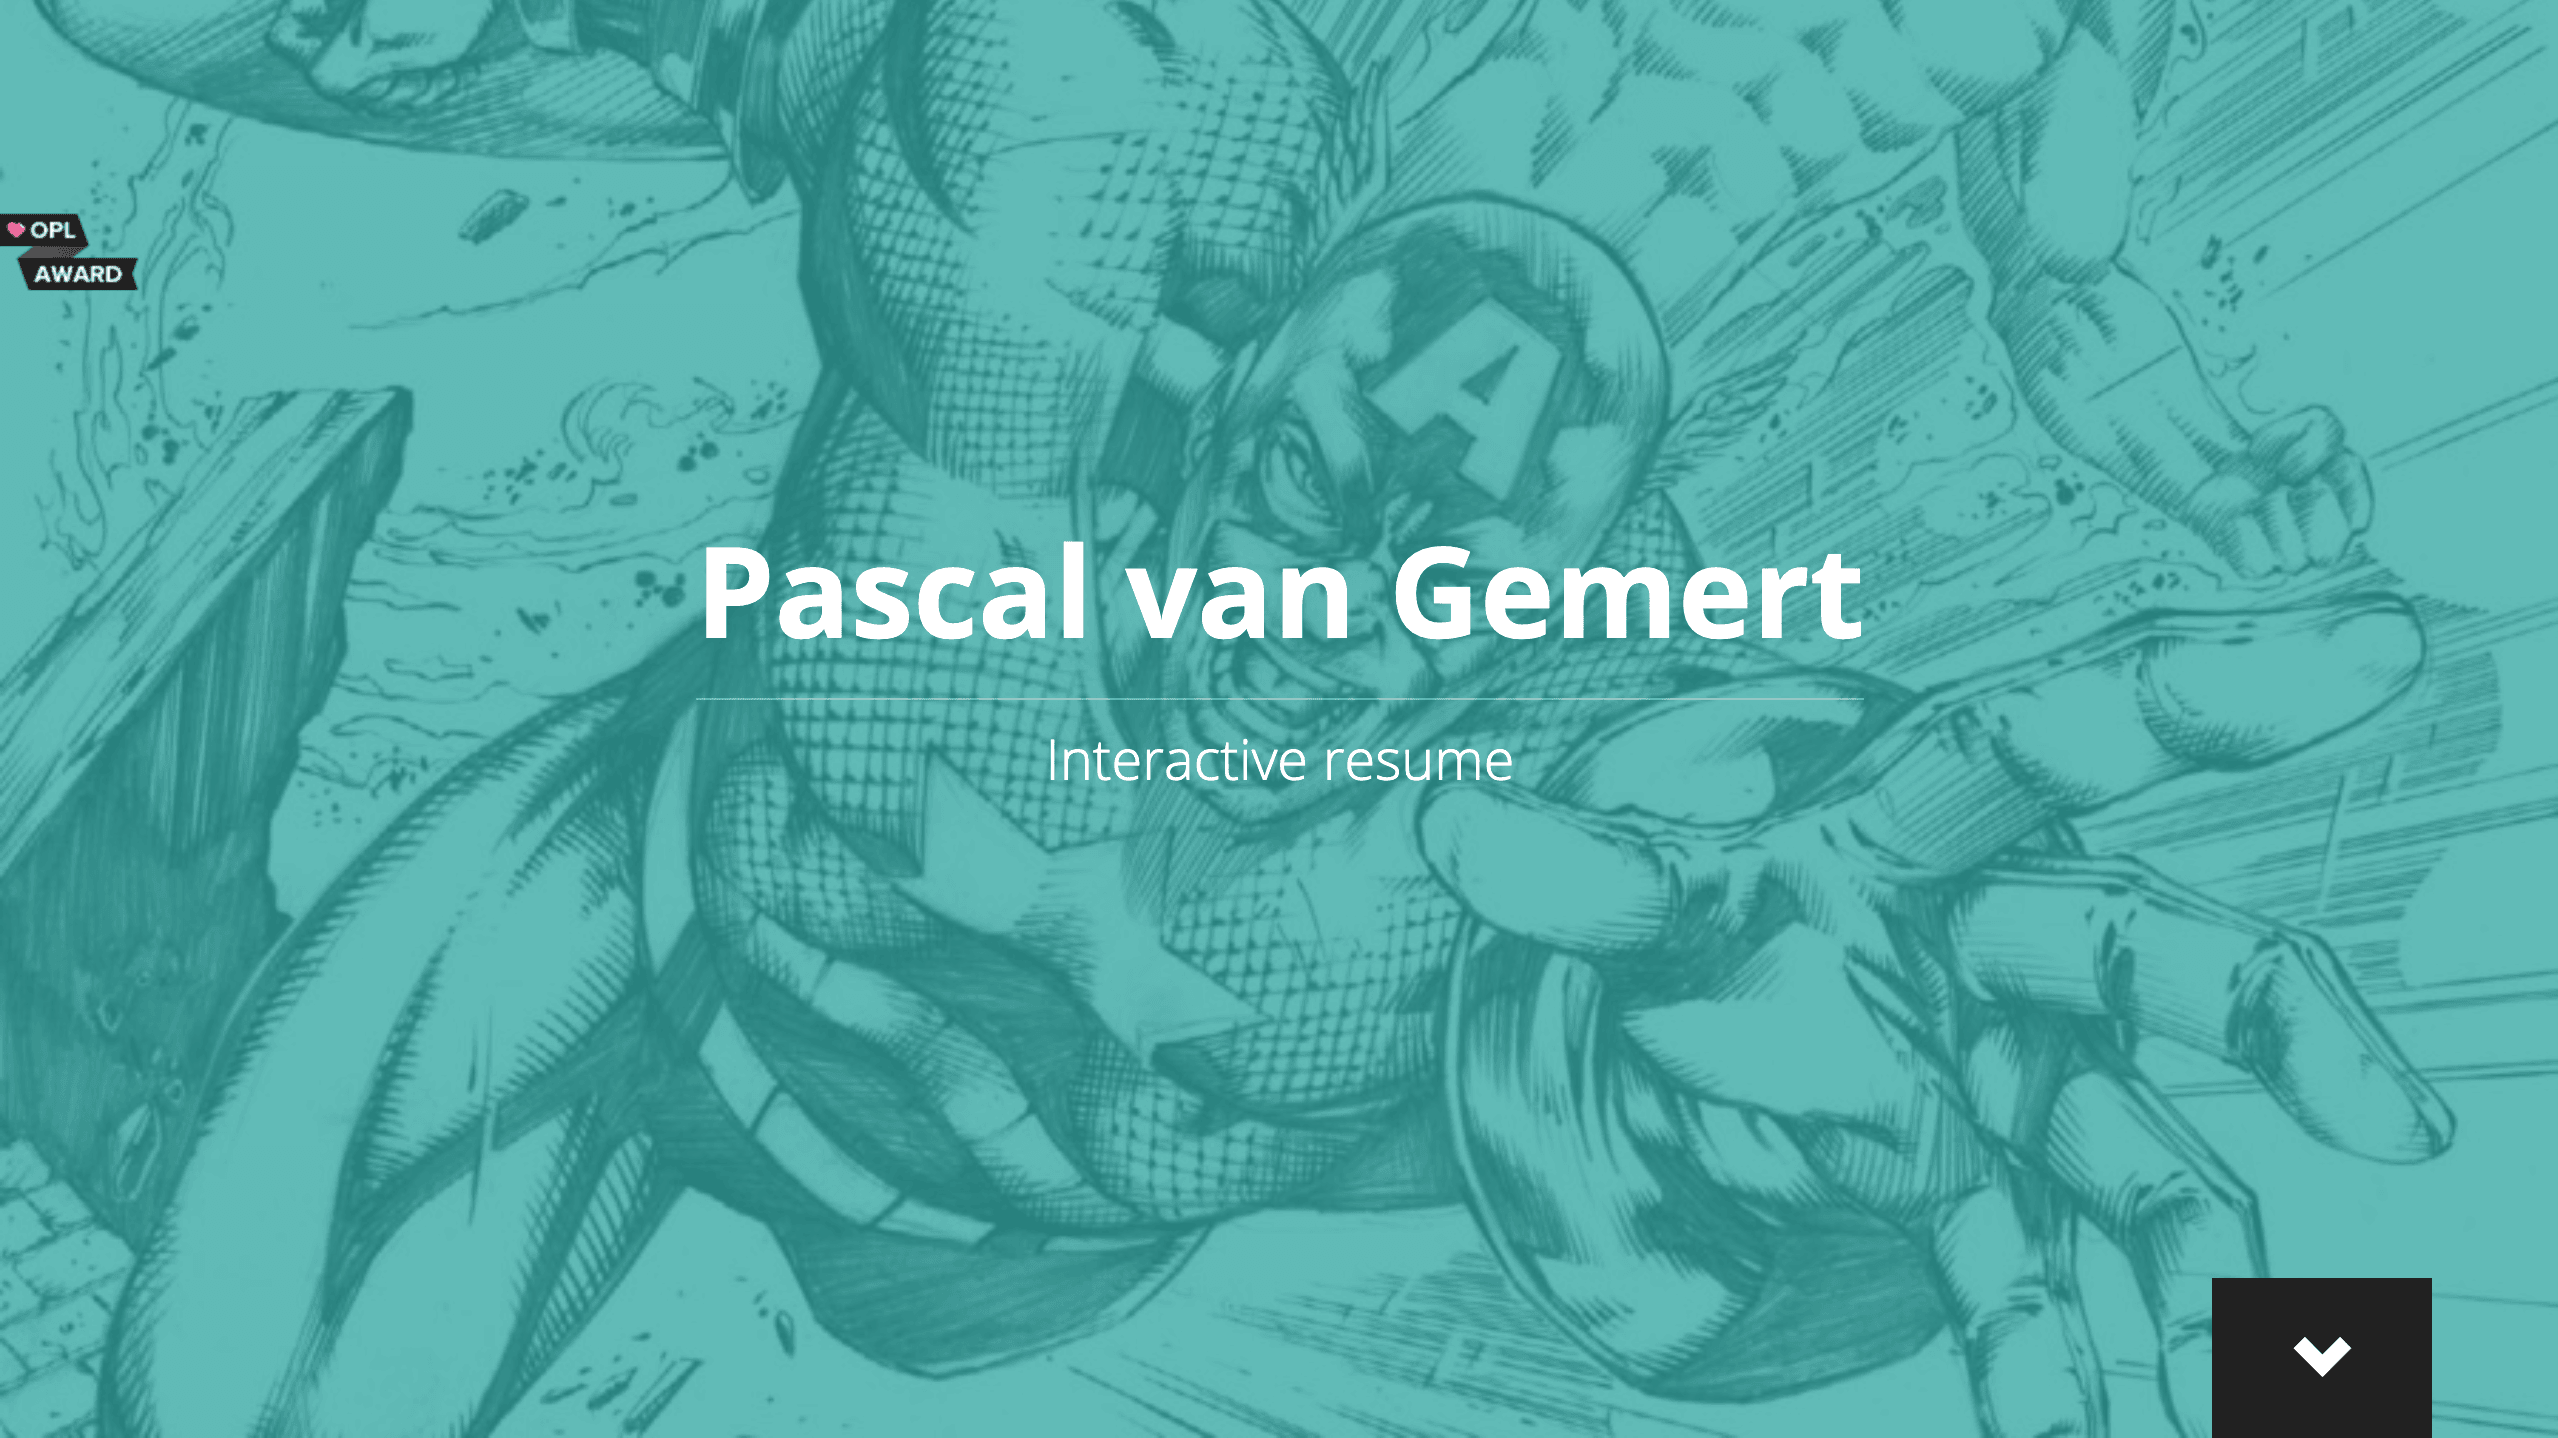 Pascal van Gemert's Resume Website